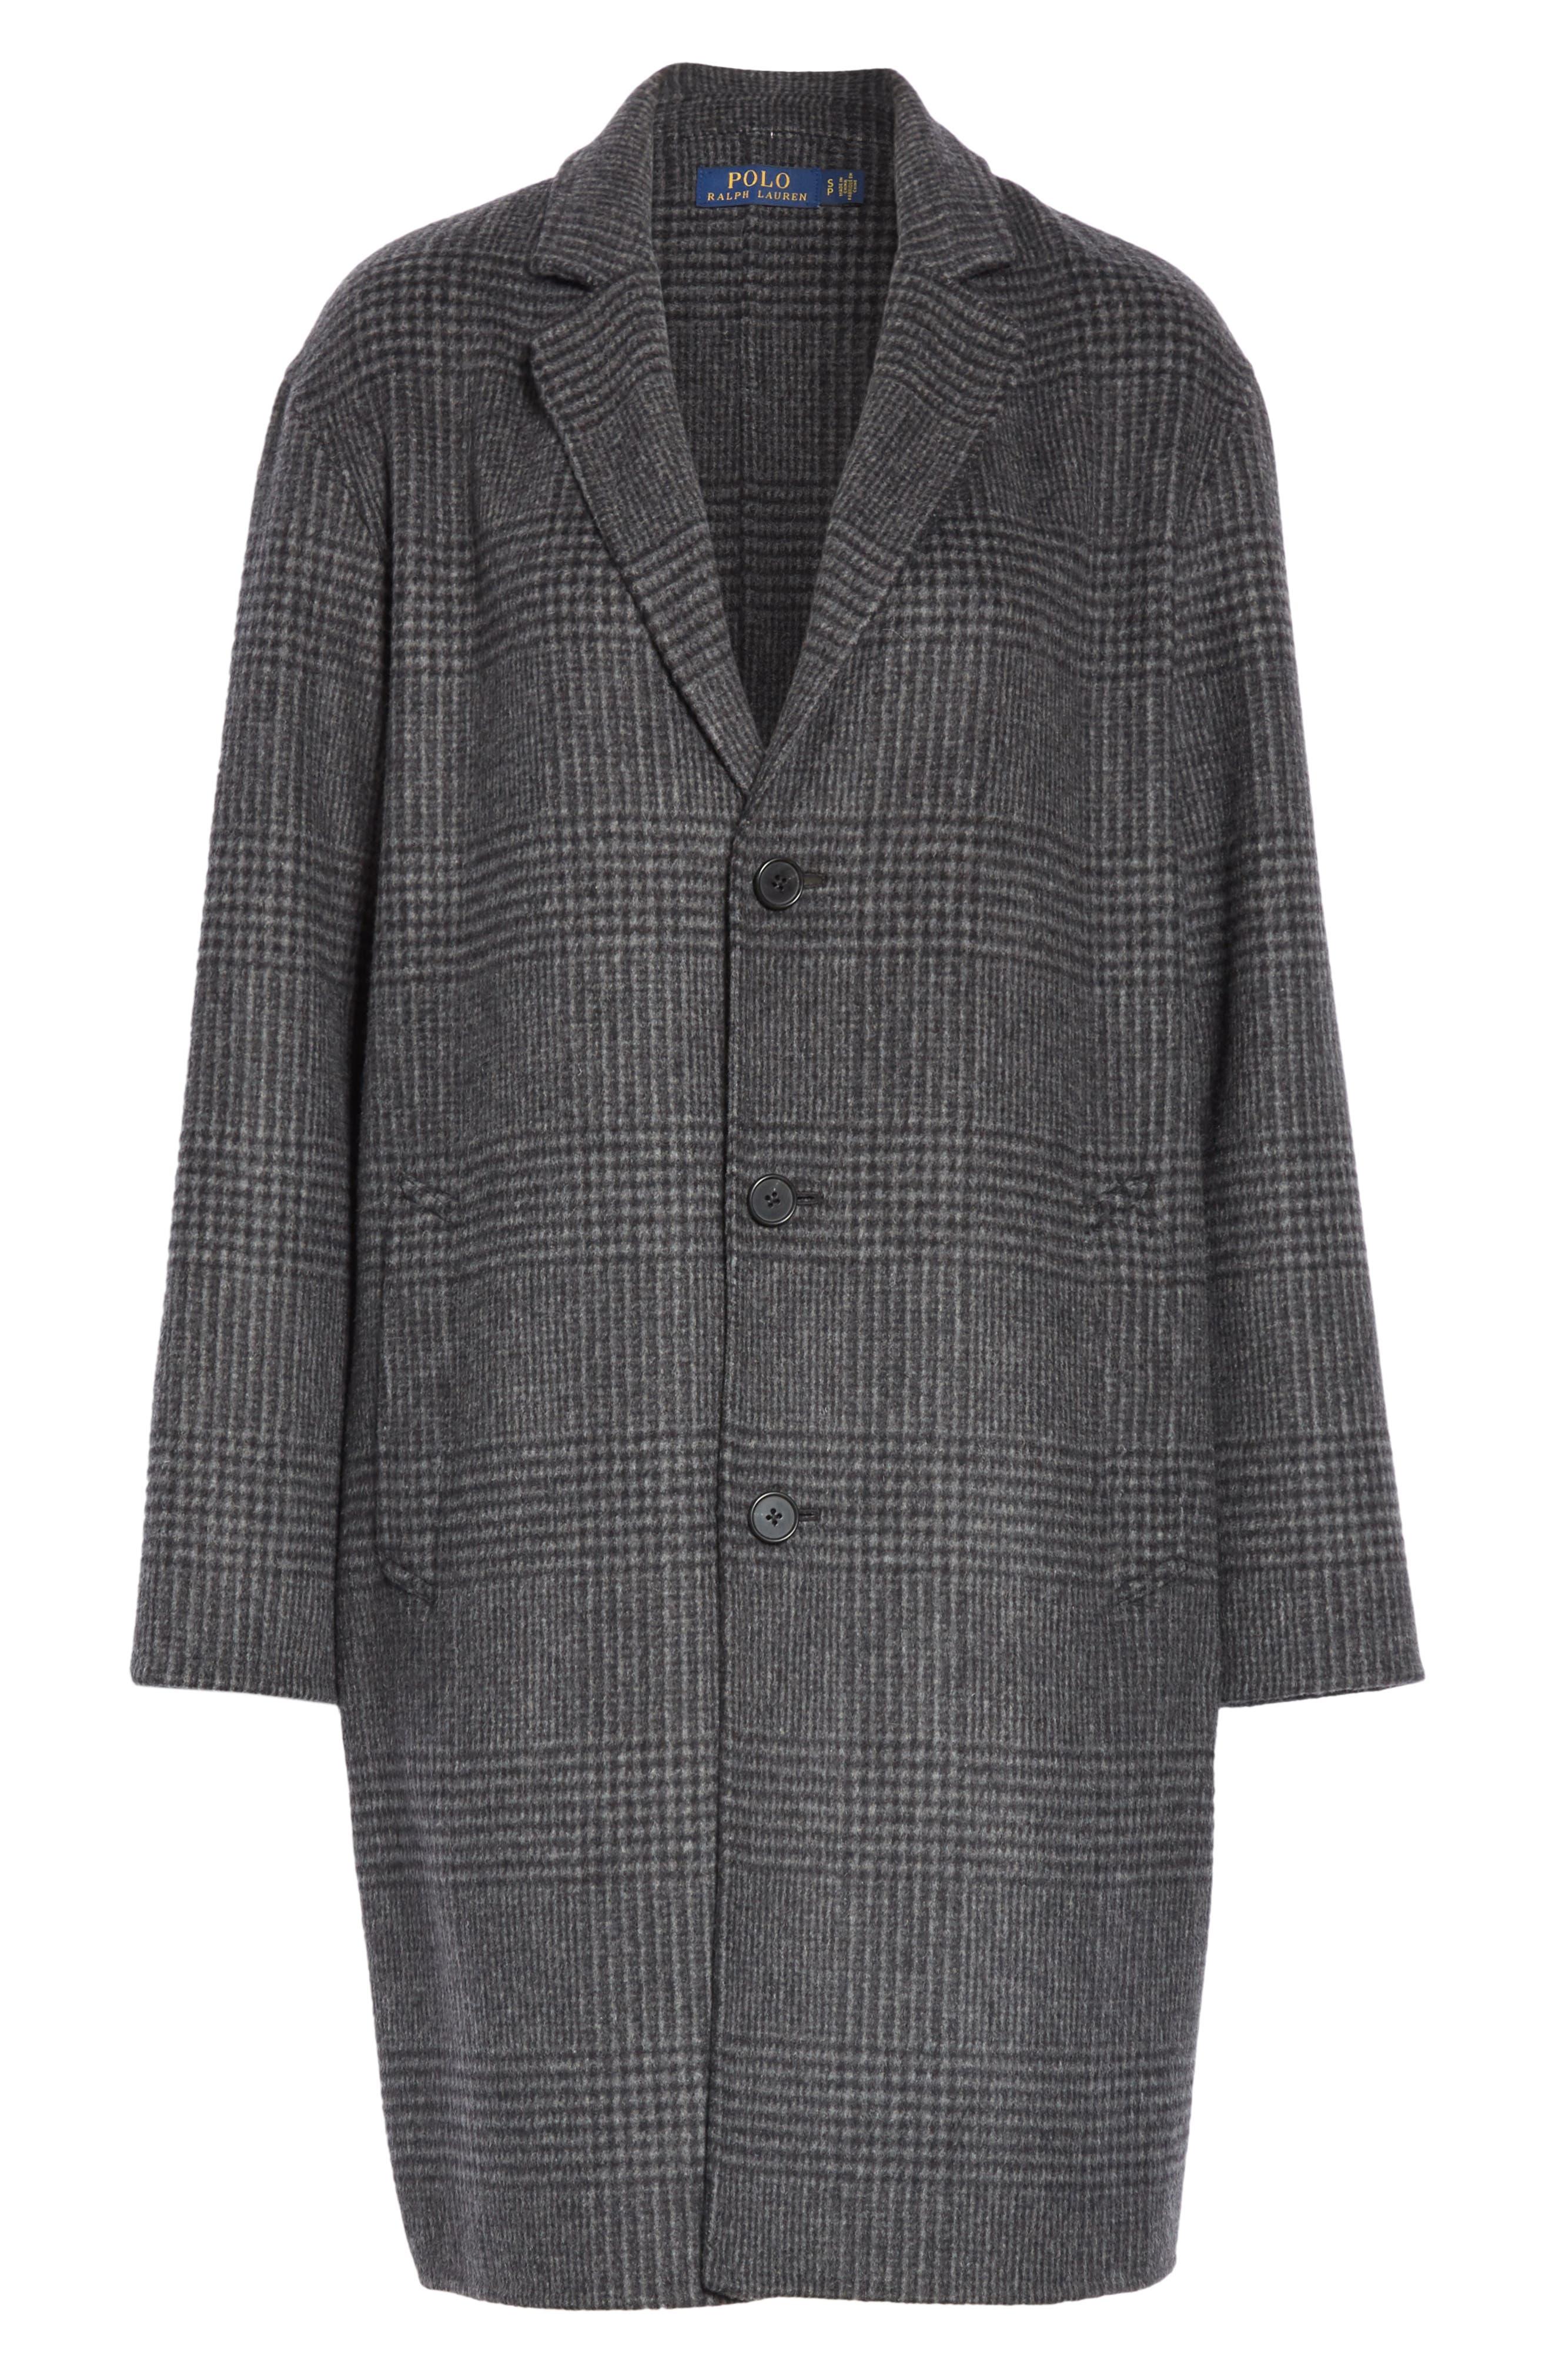 Plaid Wool Blend Coat,                             Alternate thumbnail 5, color,                             CHARCOAL GLEN PLAID